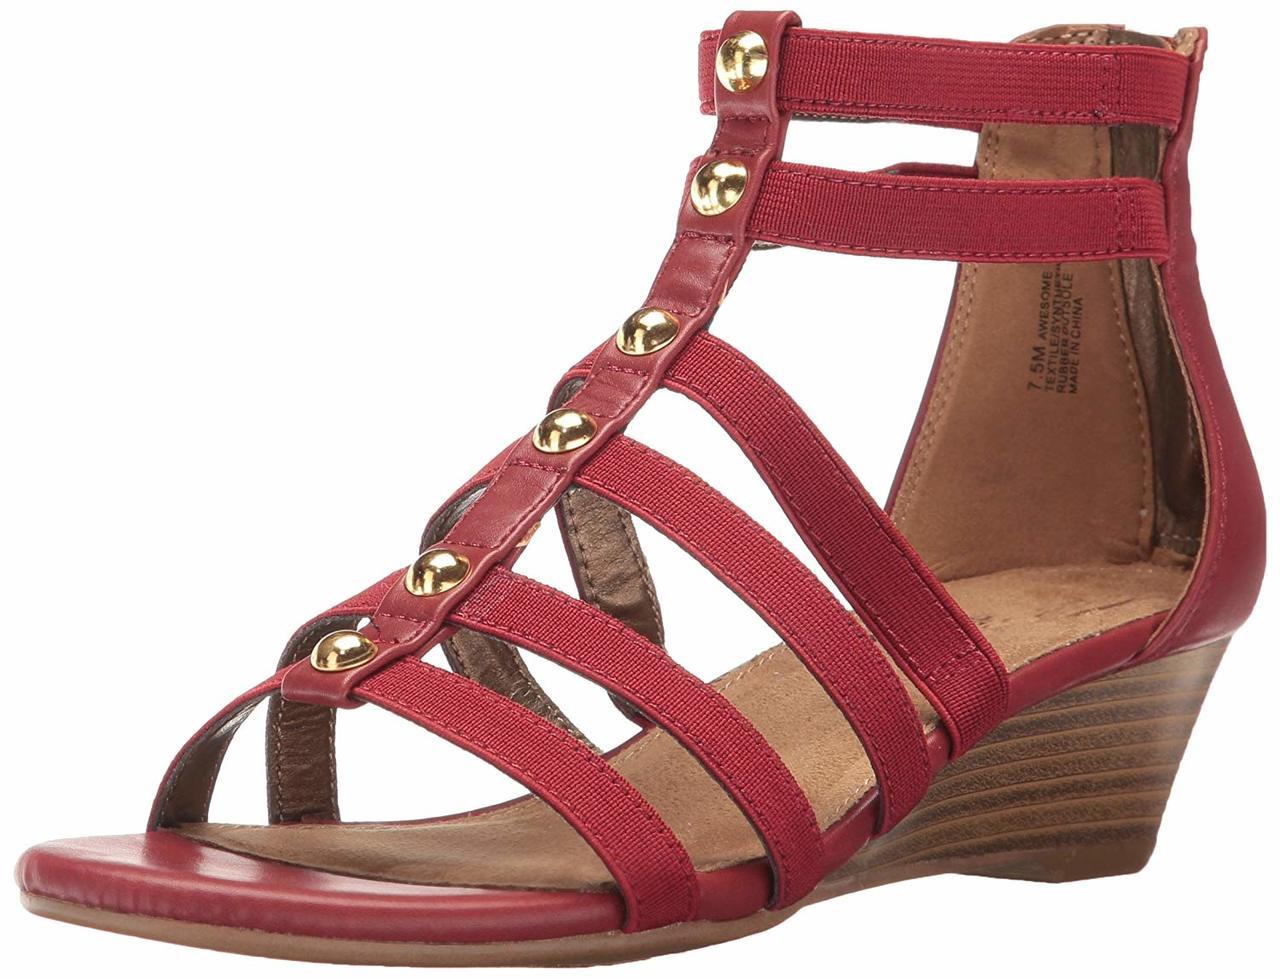 53ea3ae18d Aerosoles Women's Awesome Wedge Sandal~pp-573b3a6d - Boston Store